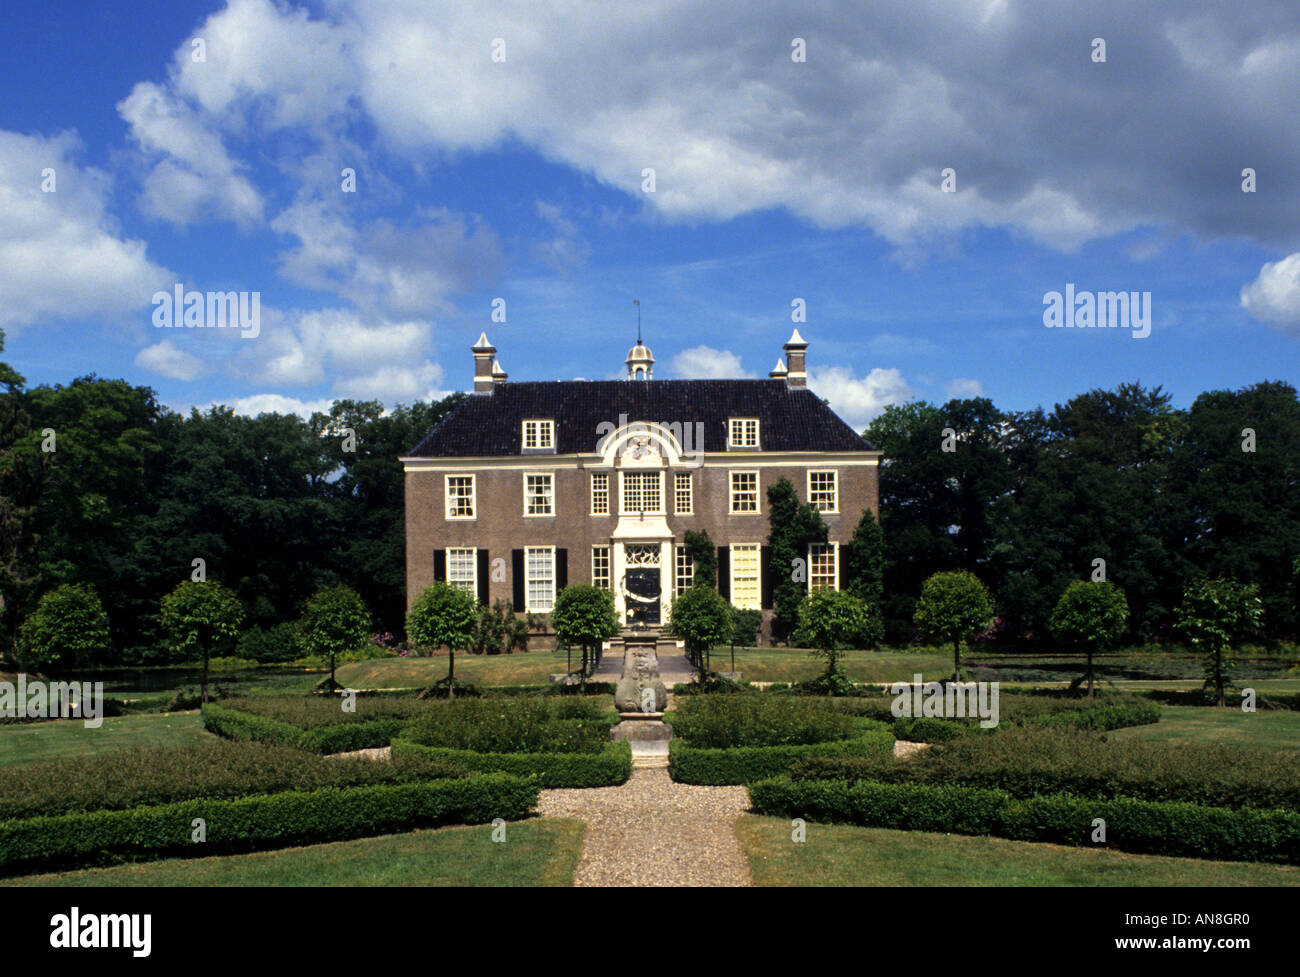 Overijsel Denkmal historische Architektur Burg Havezate Den Berg Salland Stockbild